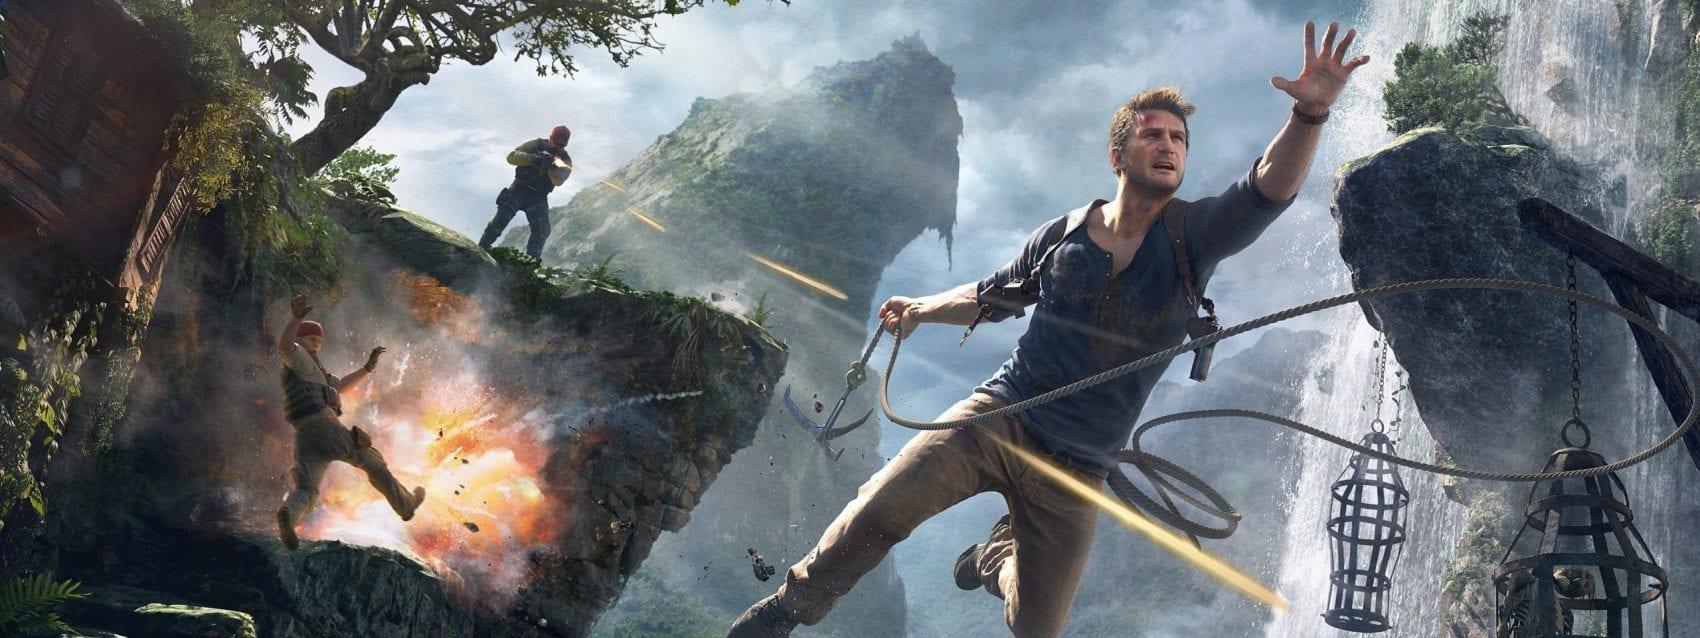 Battle Lara Croft VS Nathan Drake My Geek Actu Uncharted 4 Cover.jpg